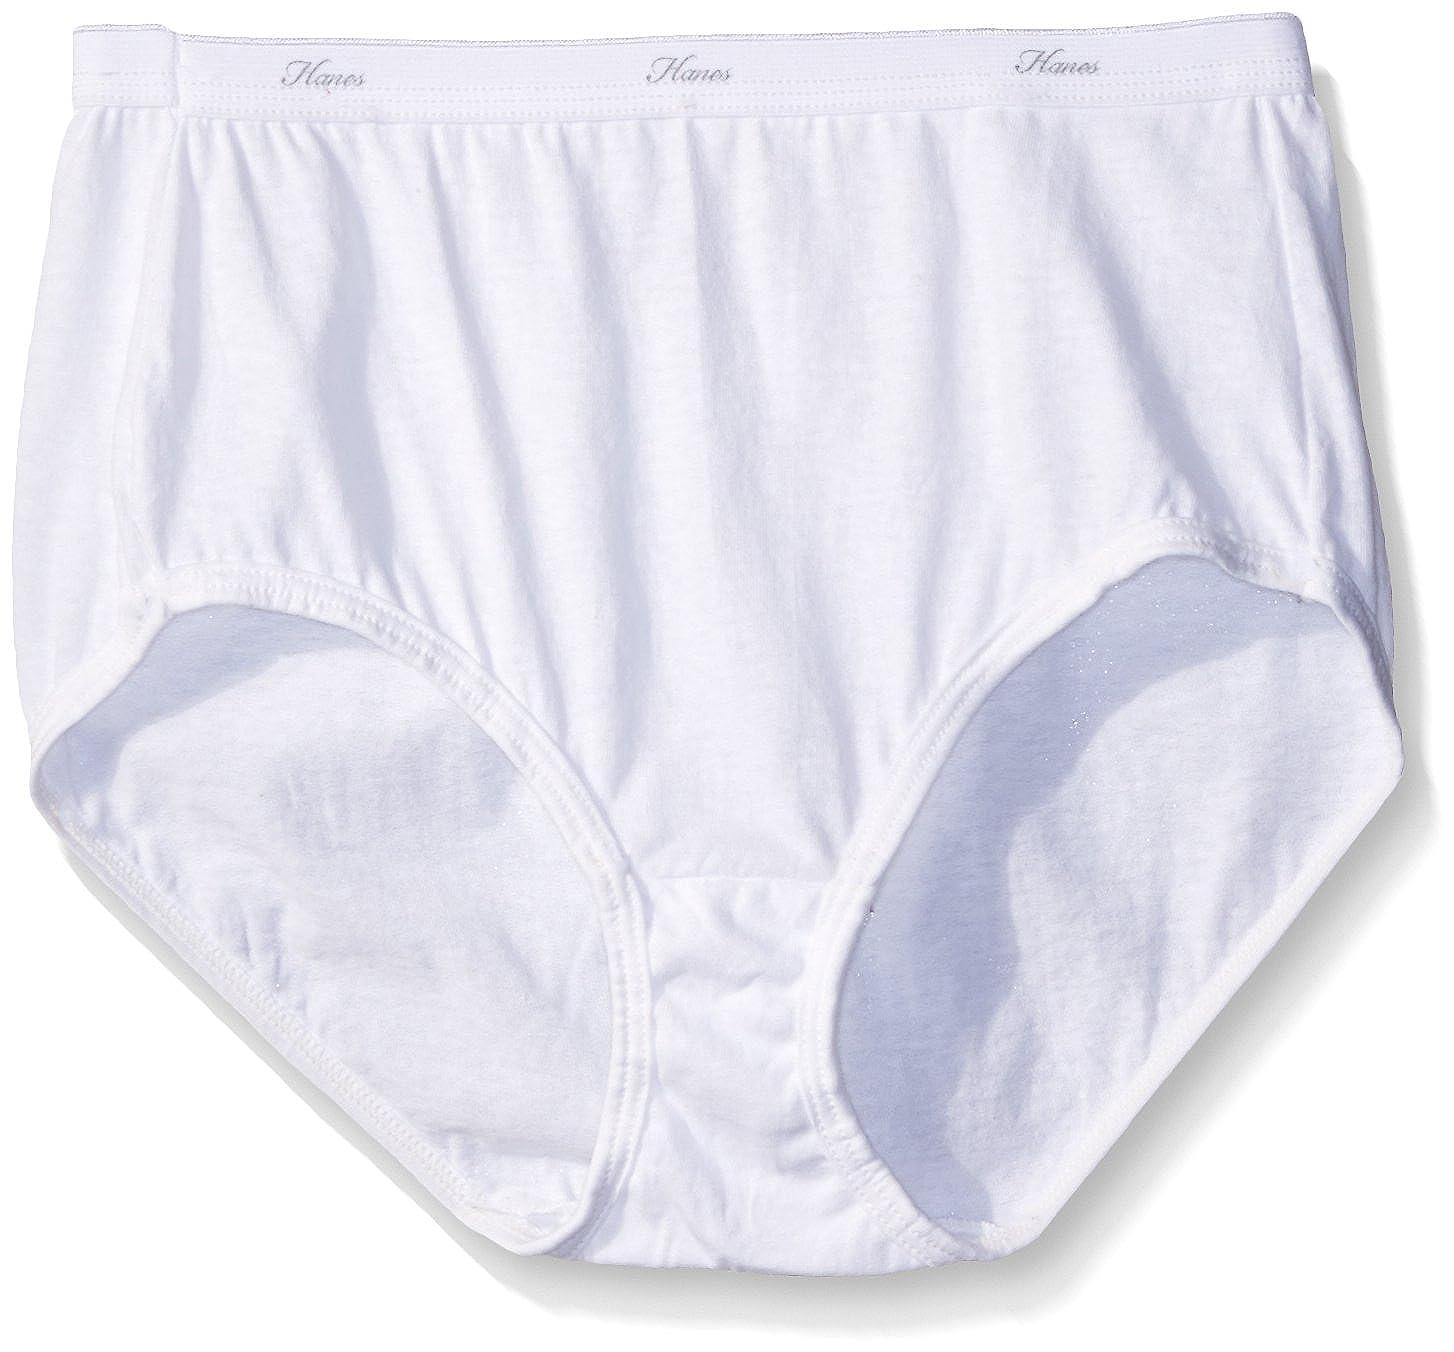 Hanes Womens Plus-Size Plus-Size Cotton Brief Plus Panty (Pack of 3) Hanes Women's Panties D40LWH